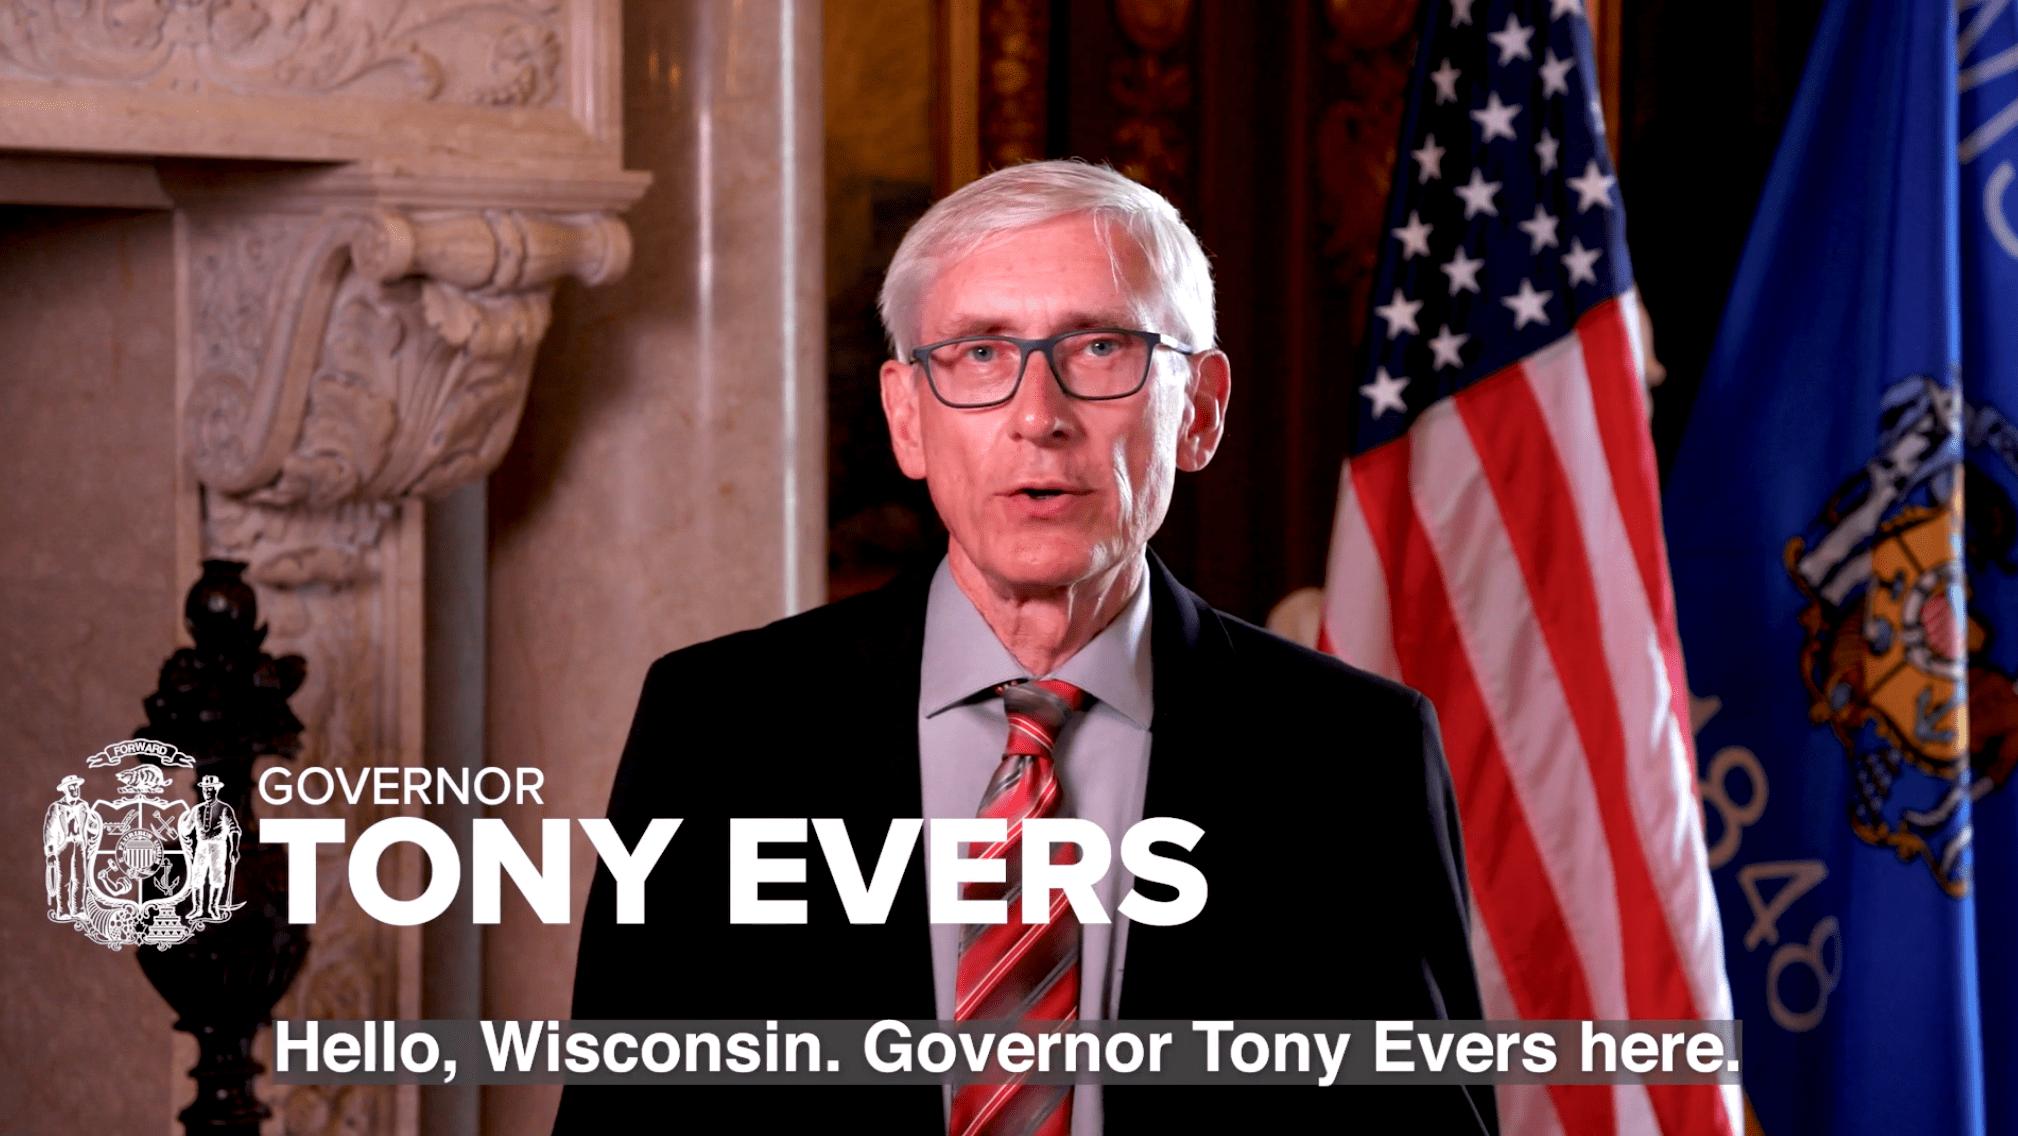 Tony Evers Wisconsin Governor